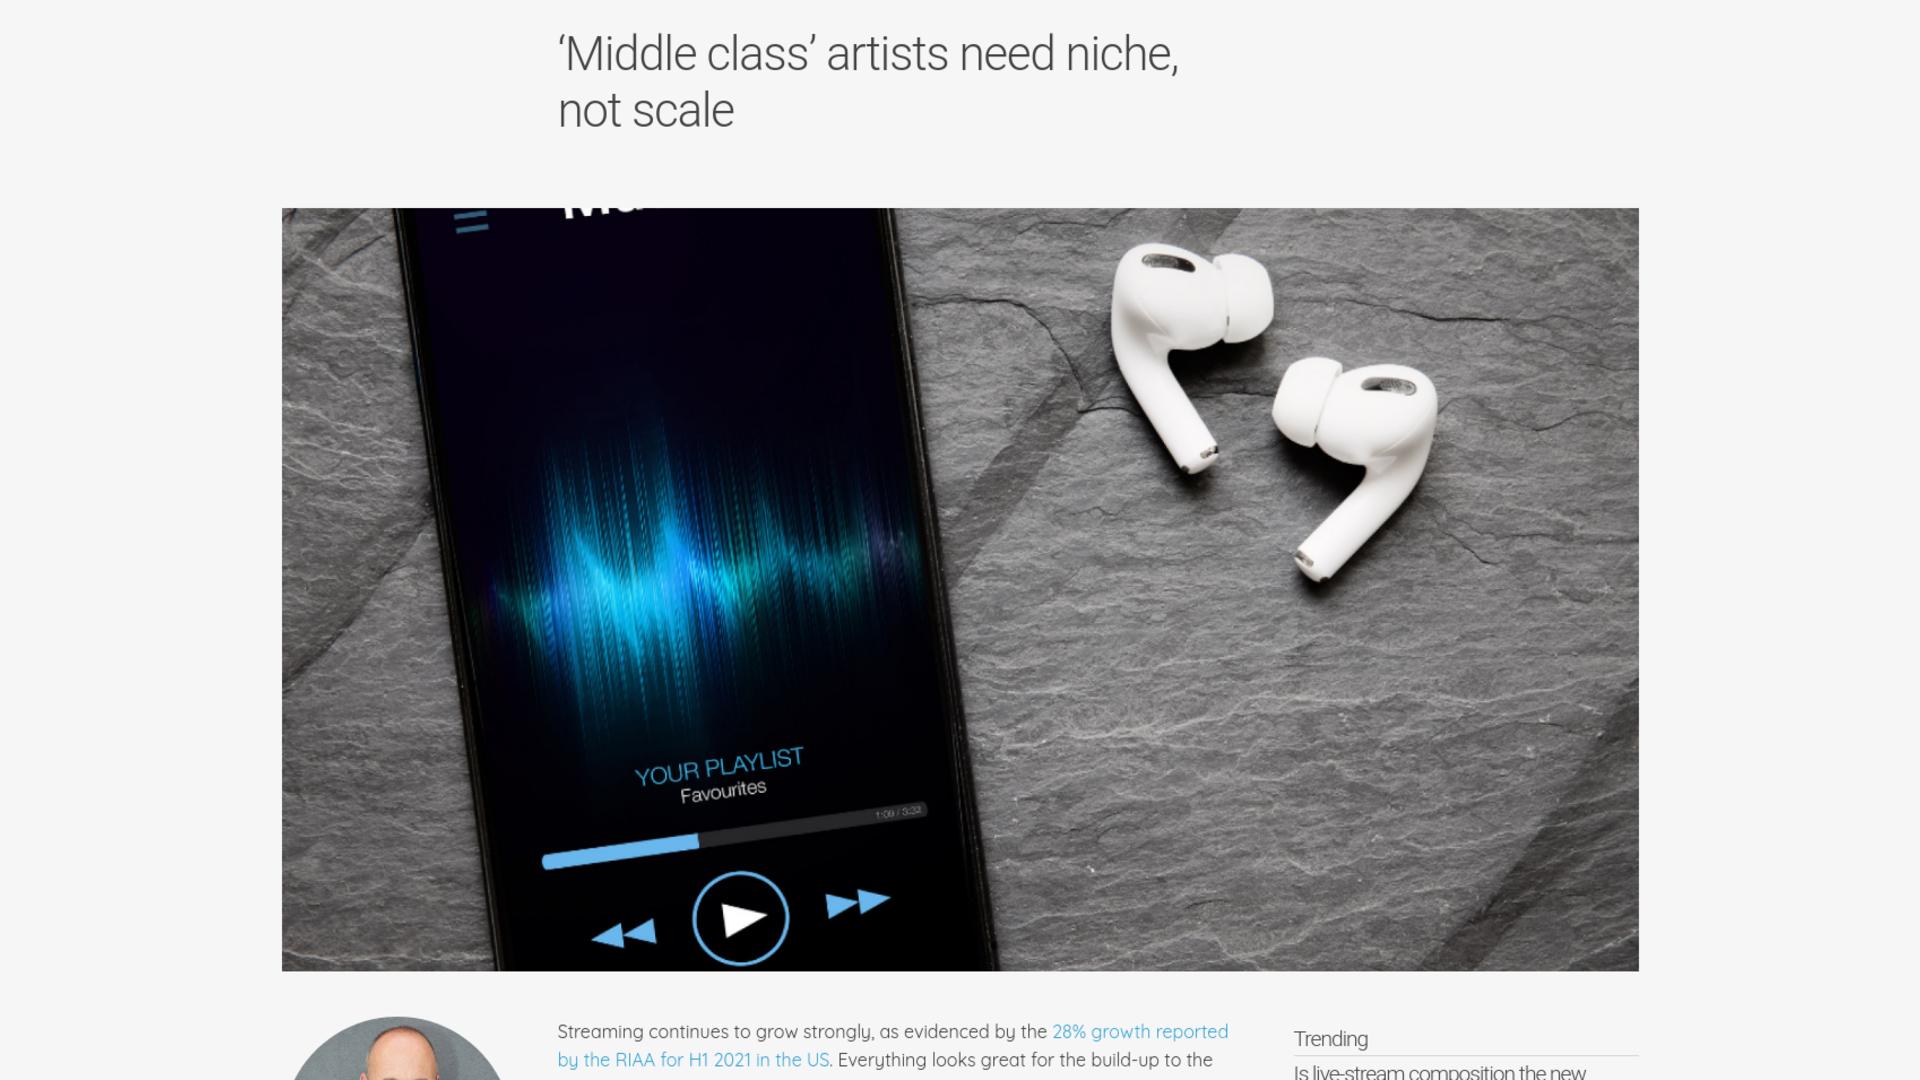 Fairness Rocks News 'Middle class' artists need niche, not scale